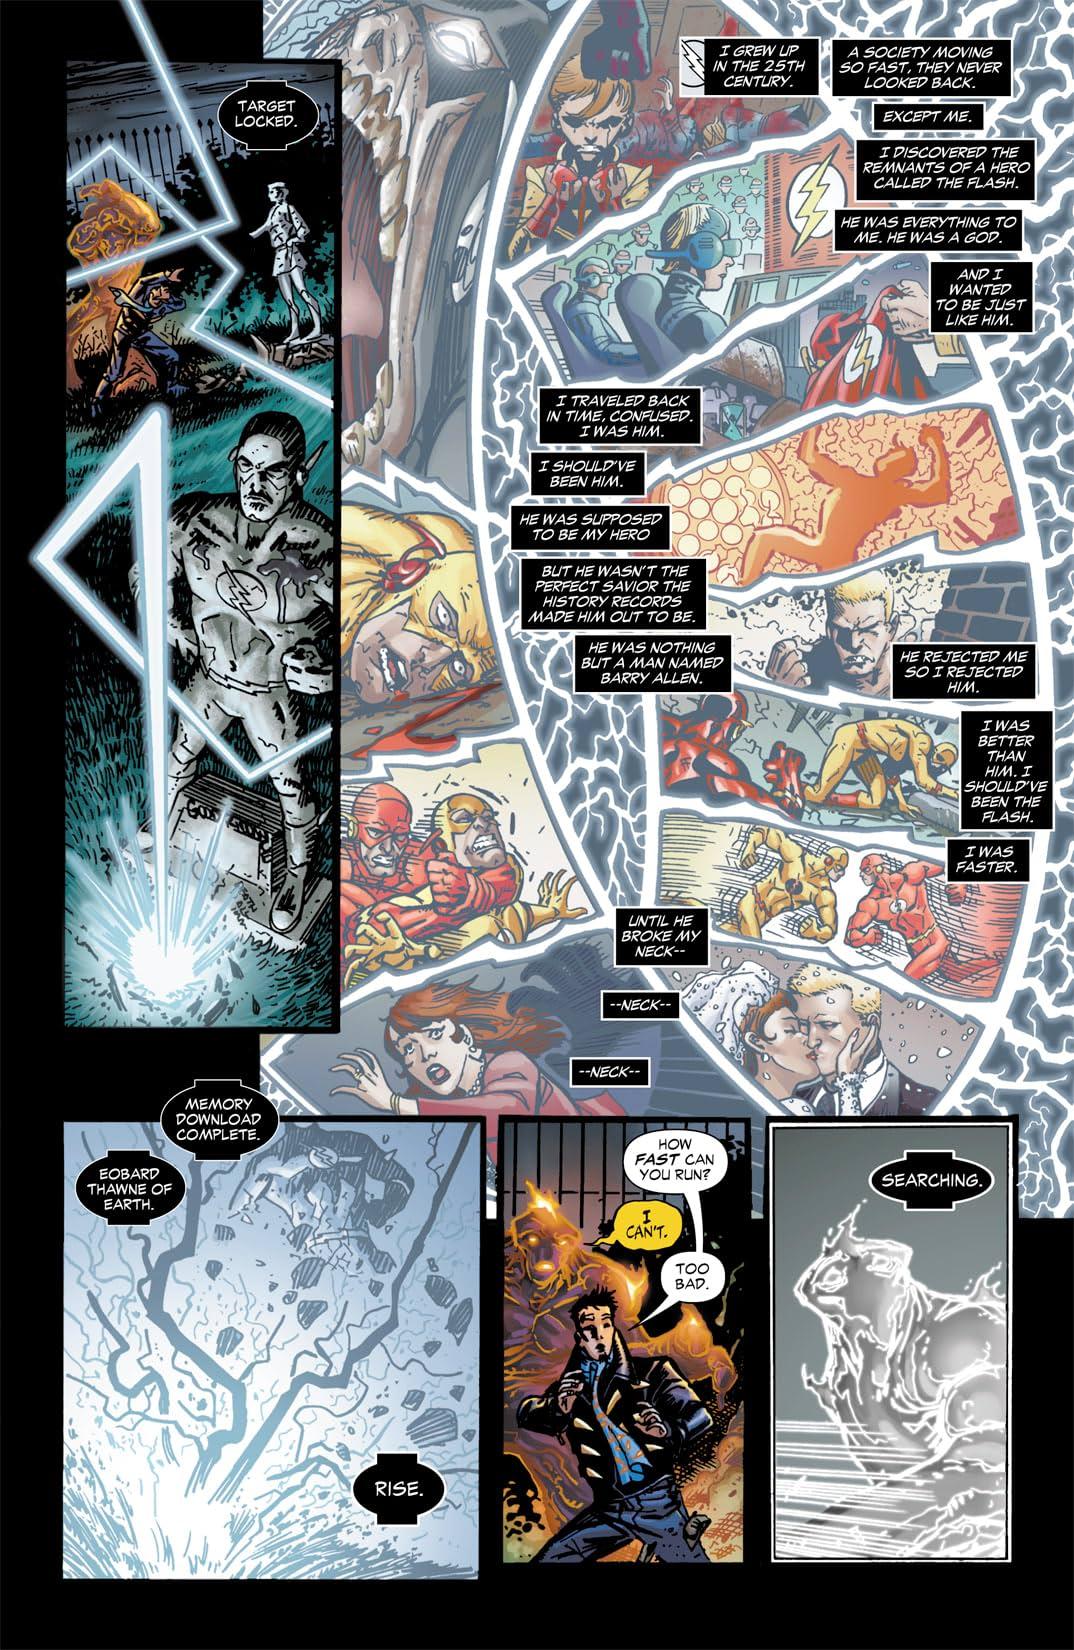 Blackest Night: The Flash #1 (of 3)